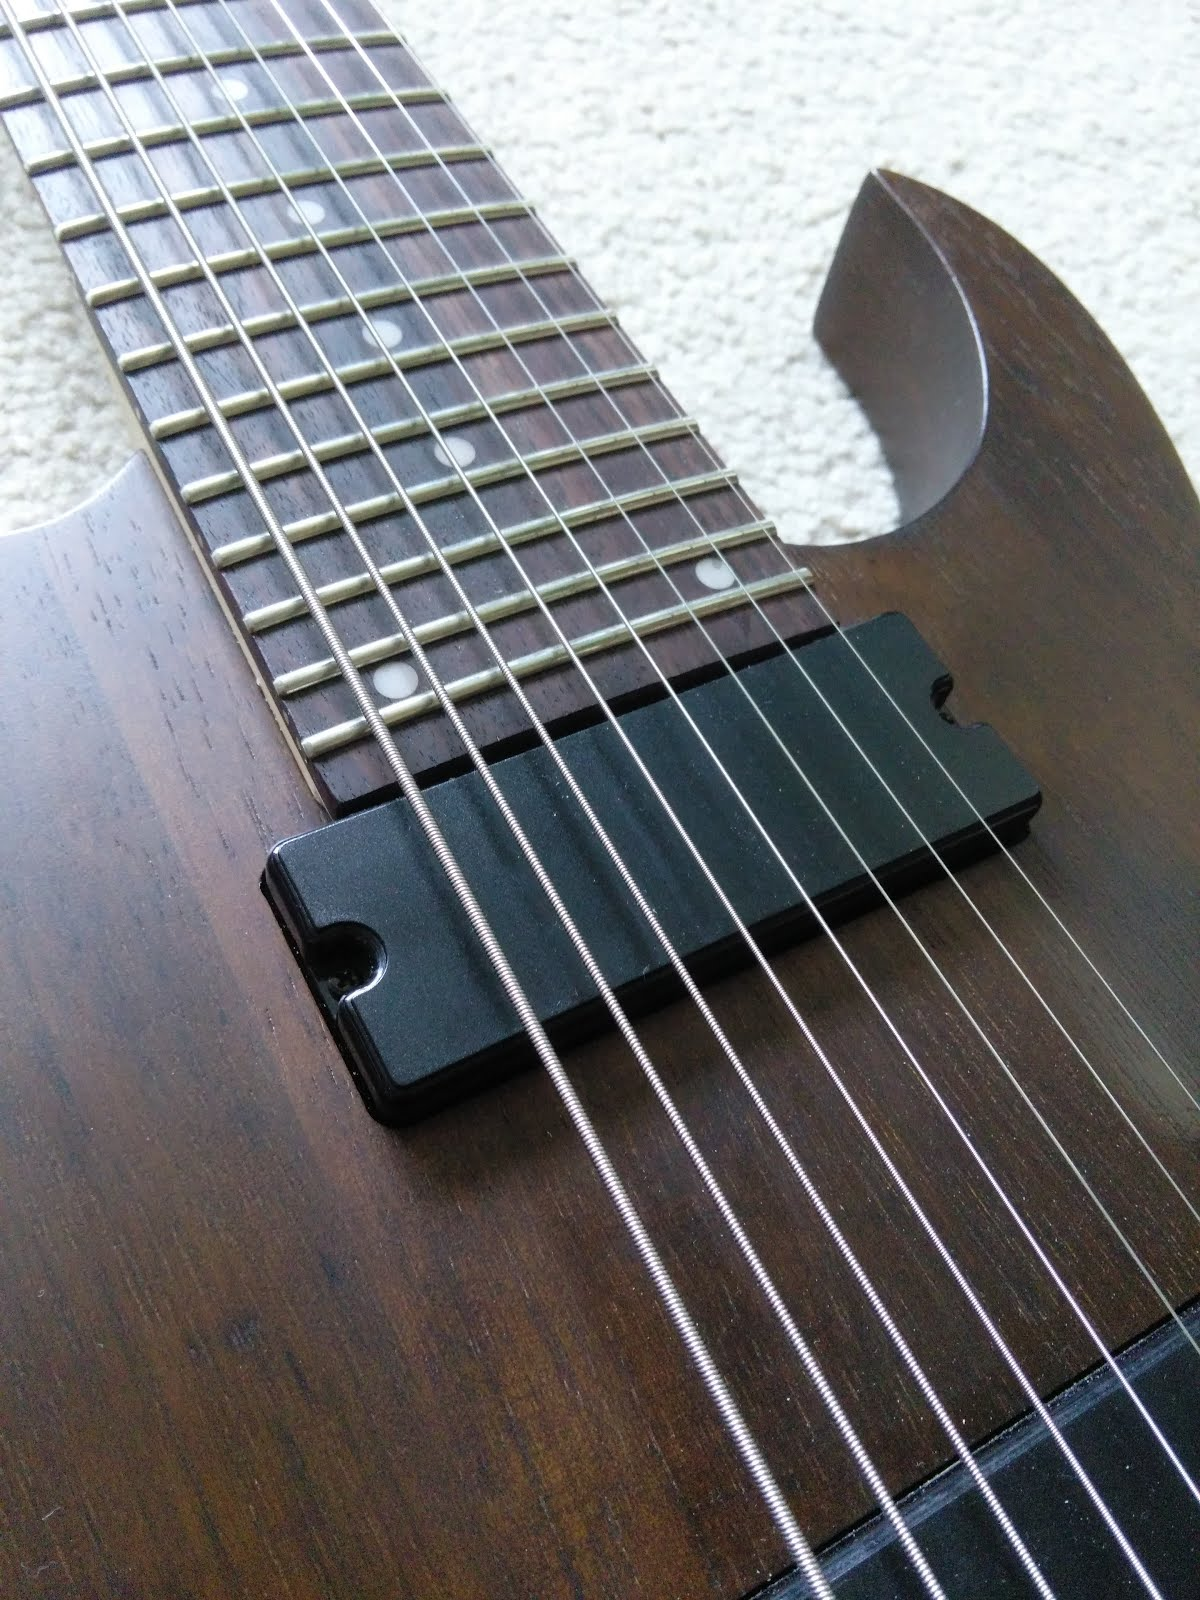 mattwins guitar pickup dc resistance measurements. Black Bedroom Furniture Sets. Home Design Ideas